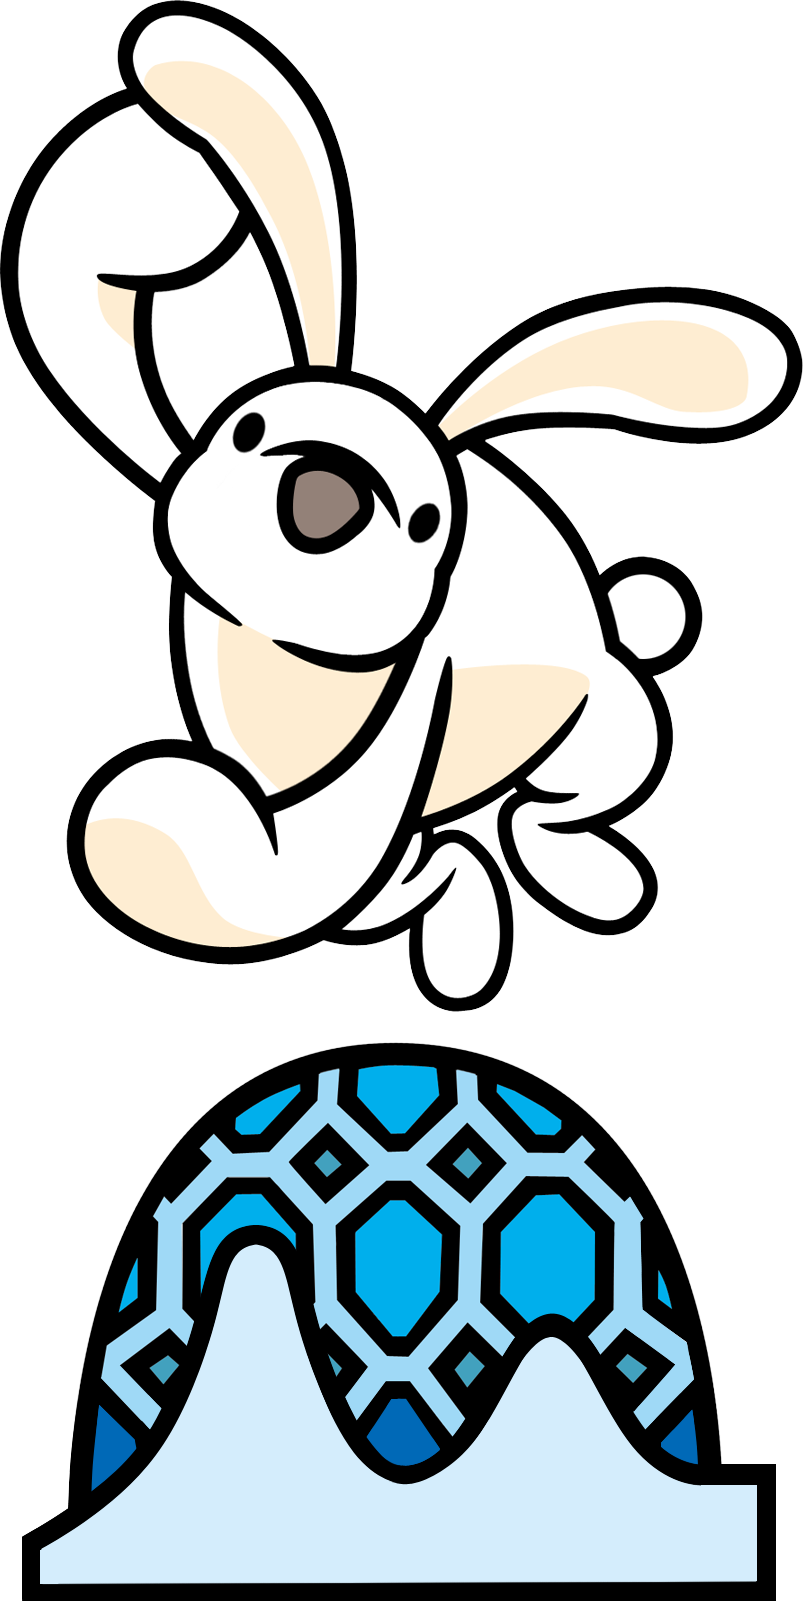 White bunny rhythm wiki. Heaven clipart kingdom heaven